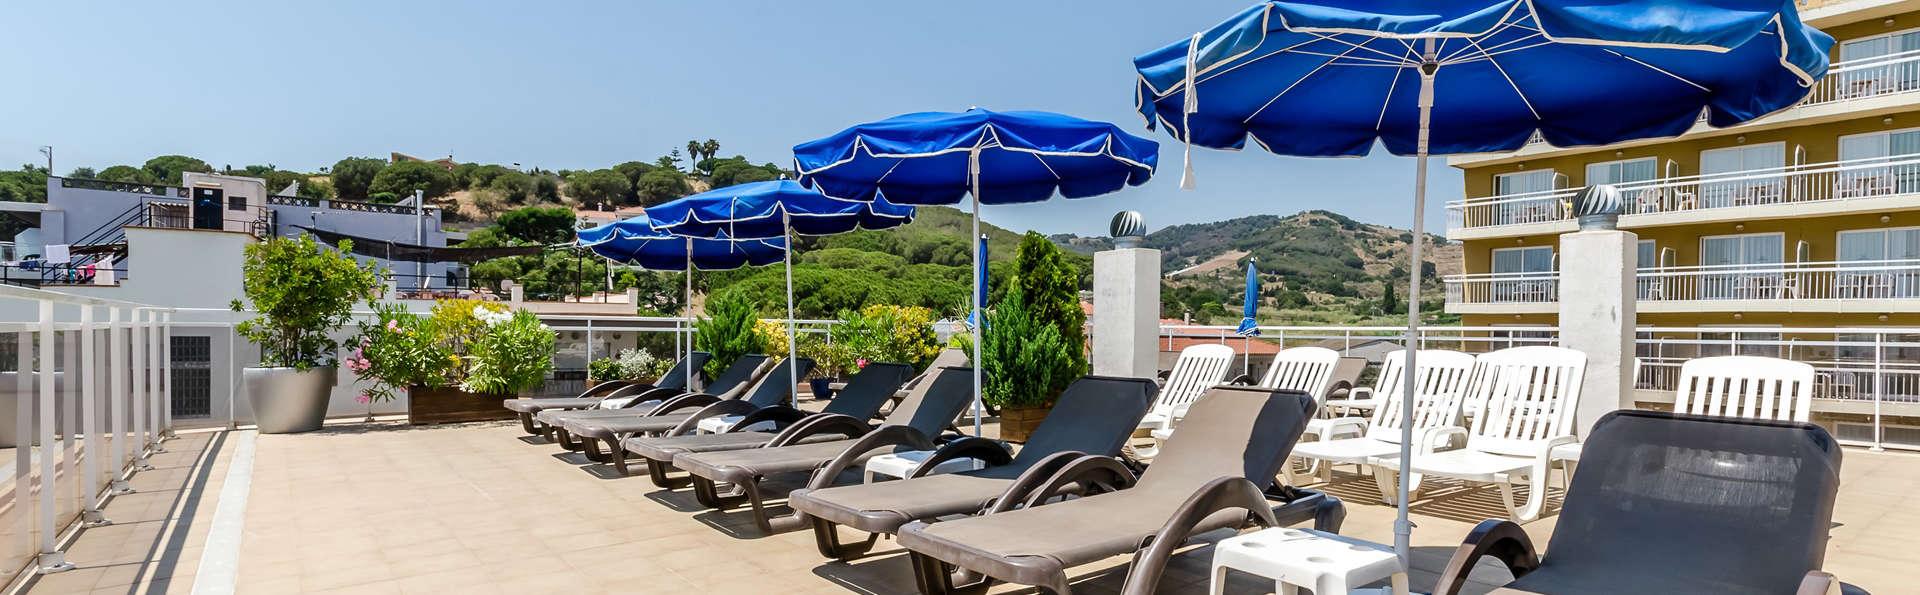 Hotel Mar Blau - Edit_Terrace3.jpg